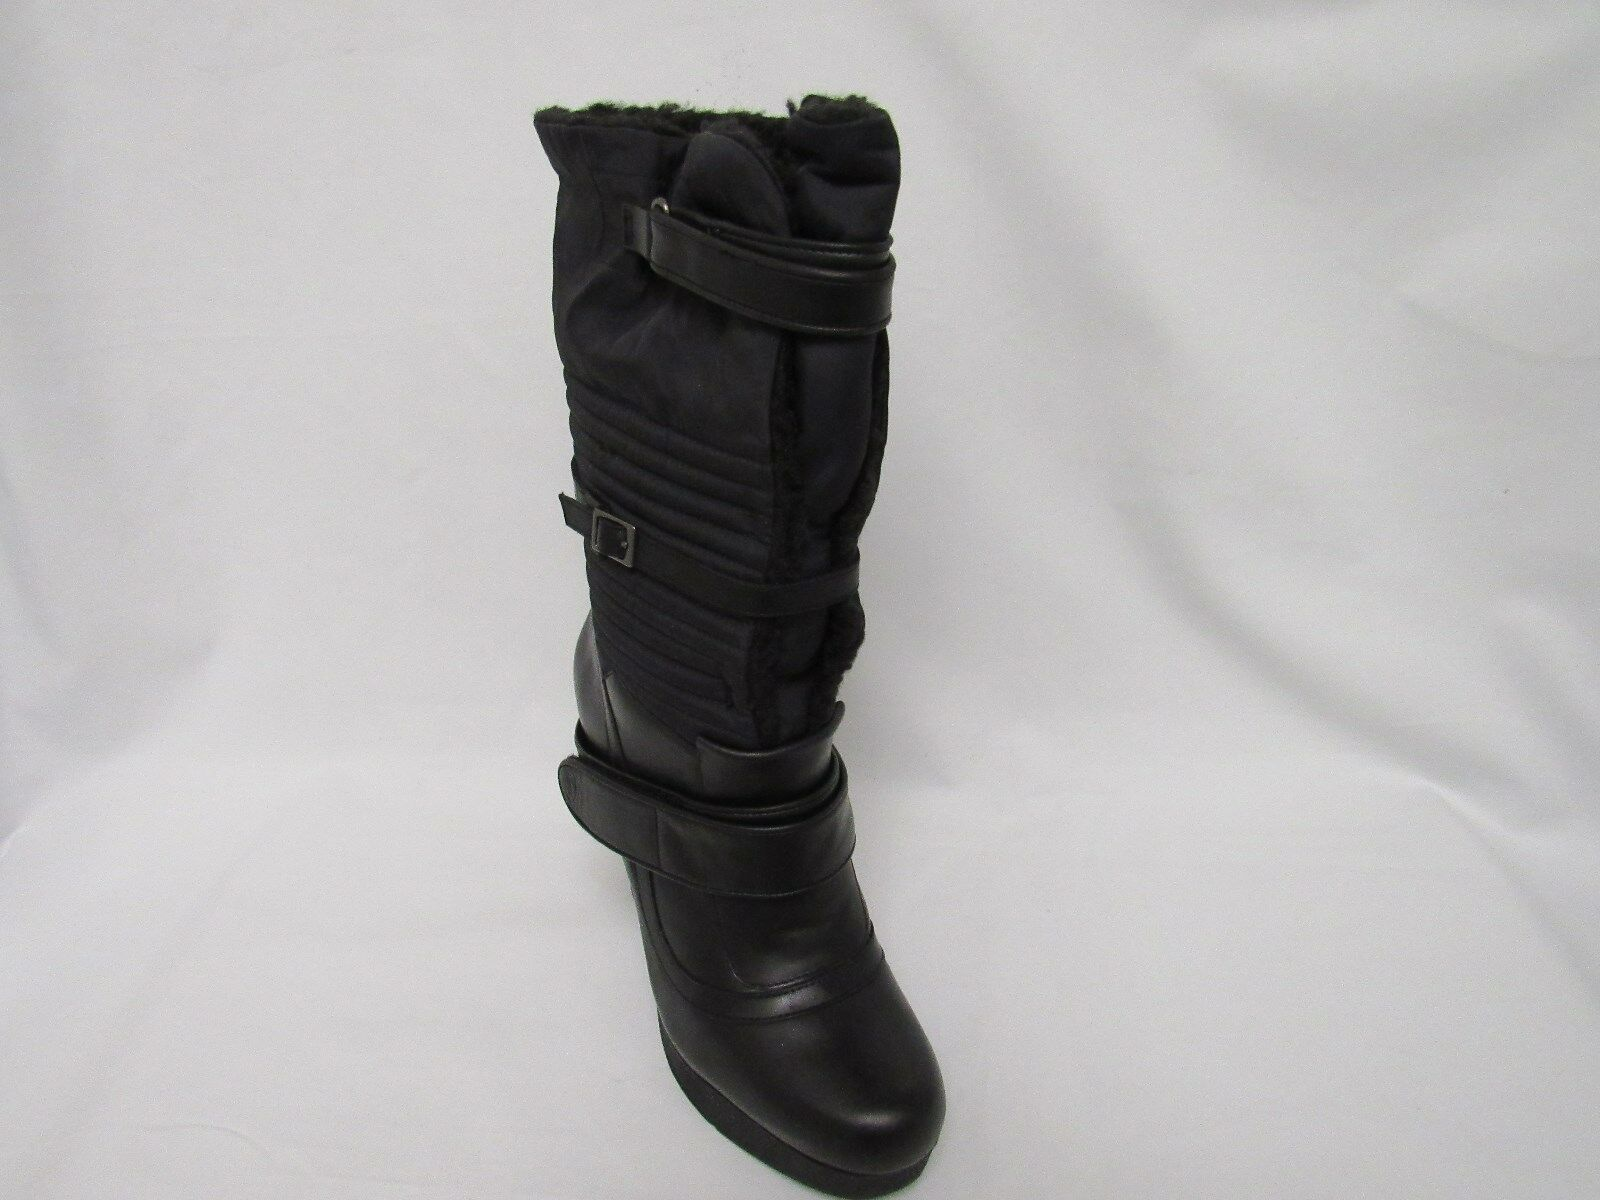 Nine West Women's Iryna Black Fabric Boot Size 8.5M